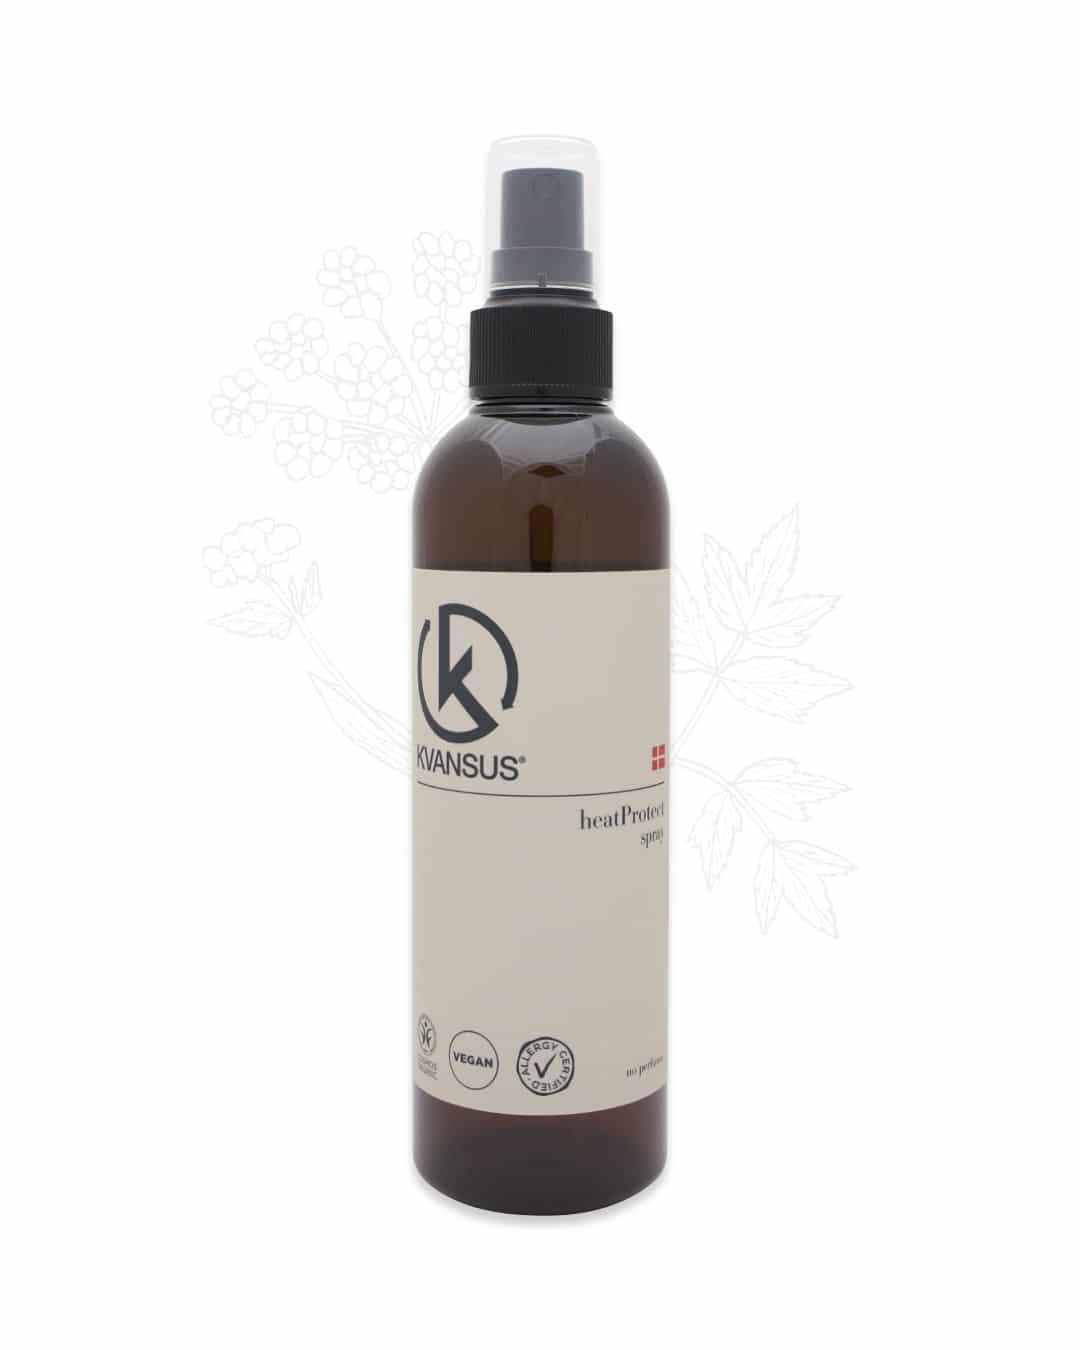 heatProtect <br />spray 1